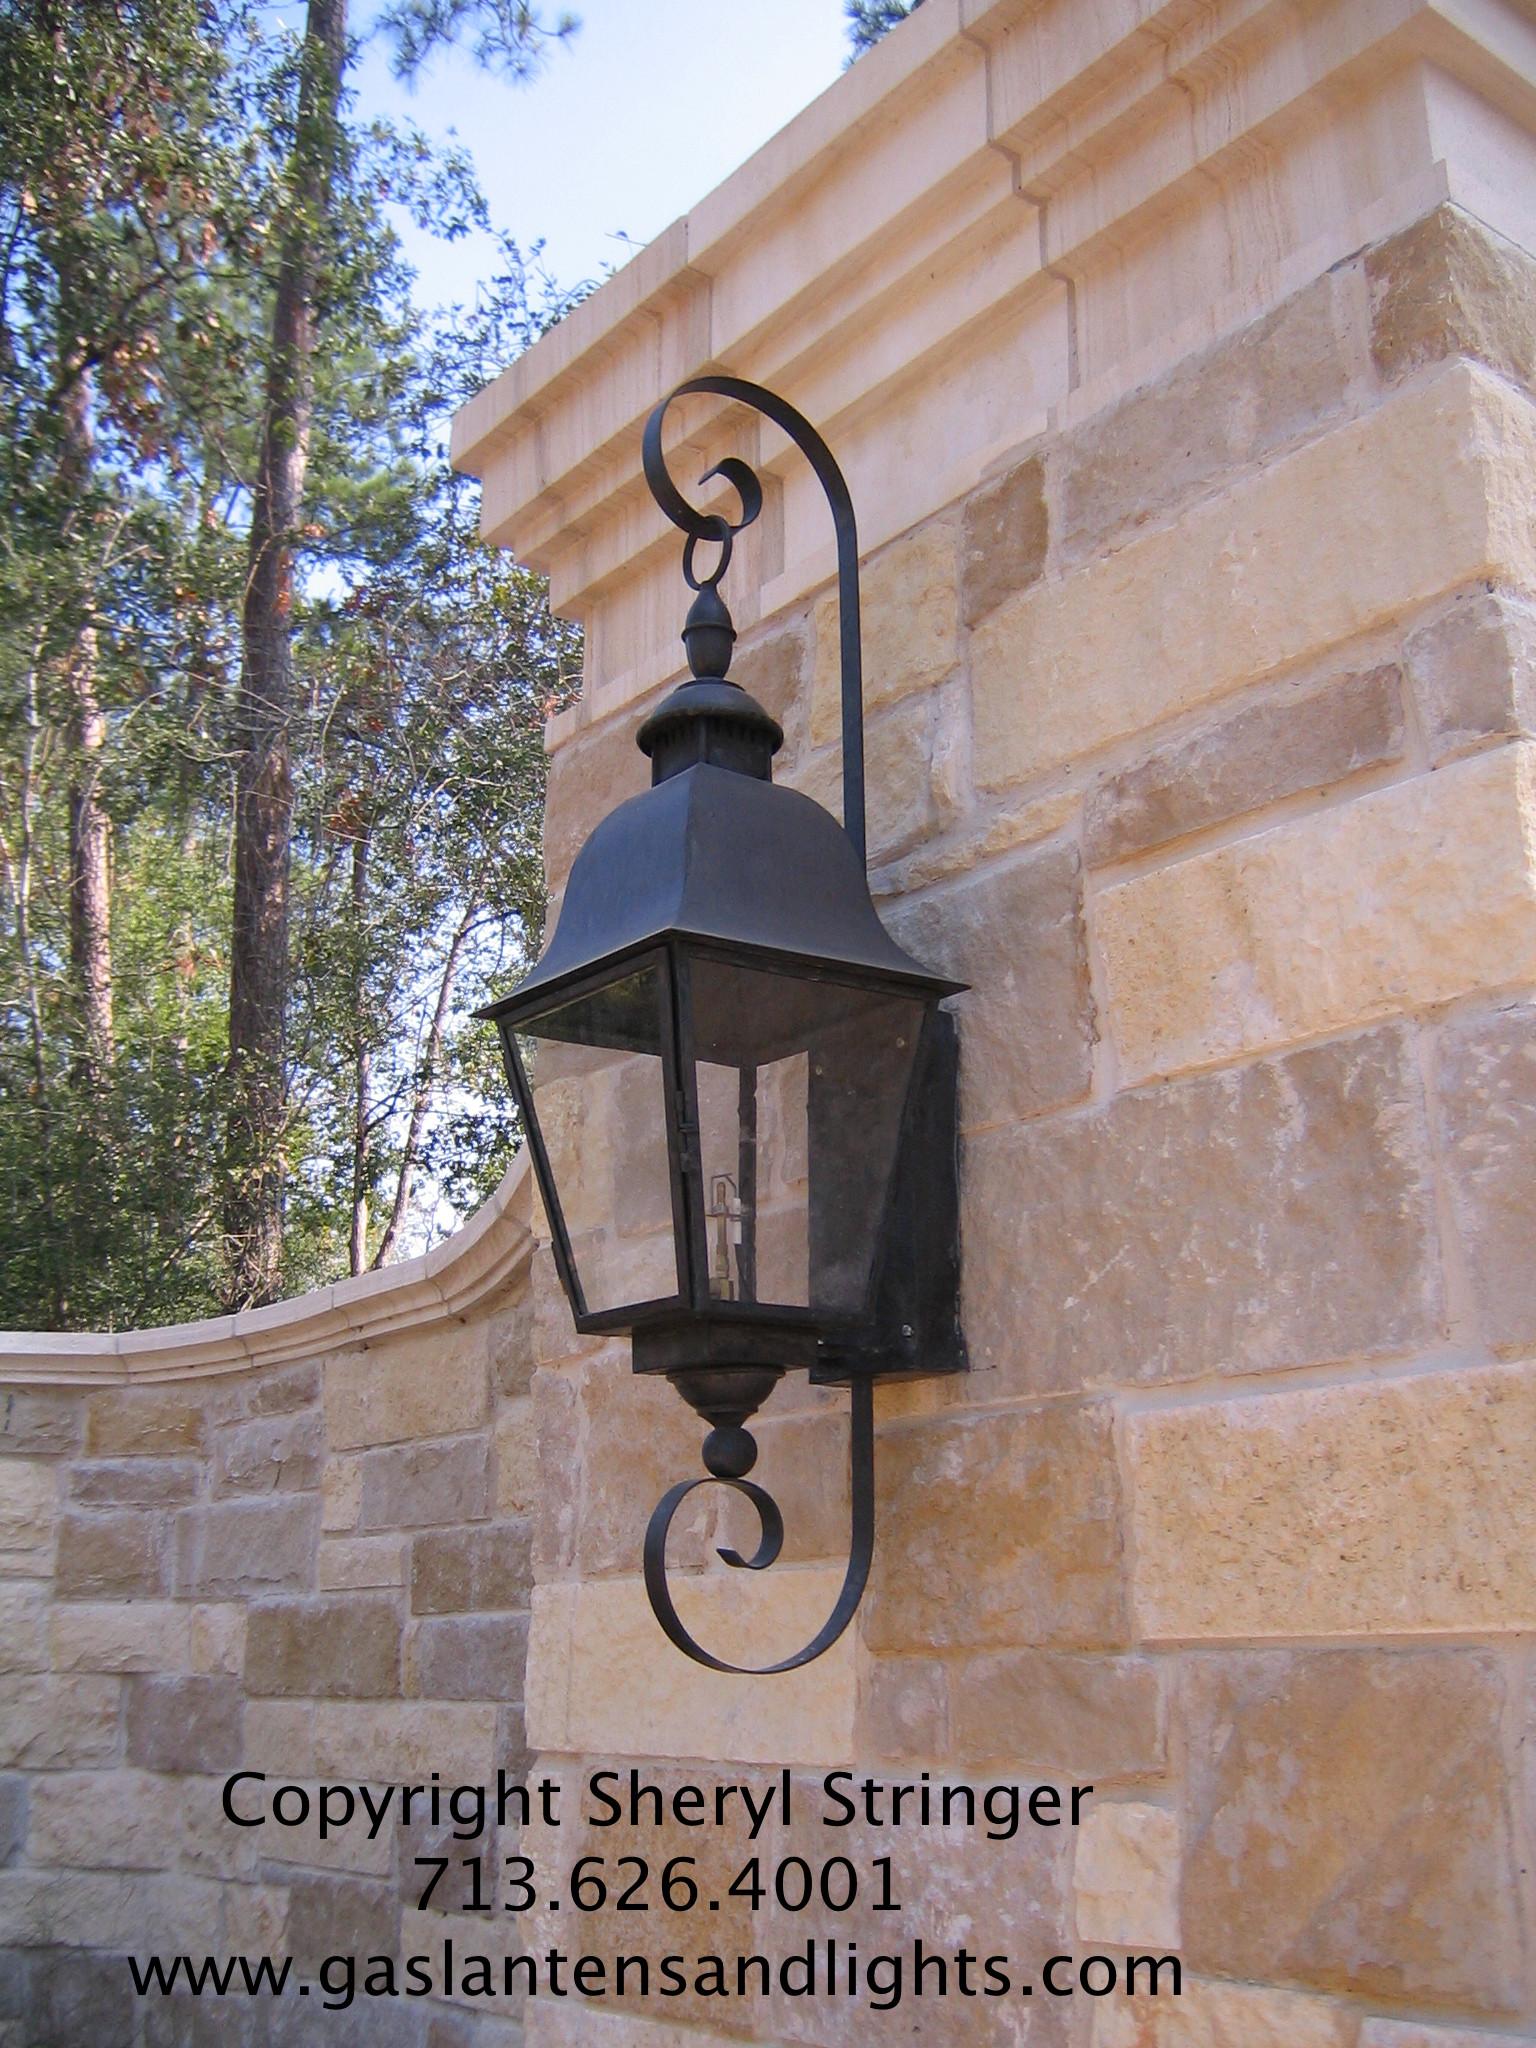 Sheryl's Tuscan Gas Lantern with Curls